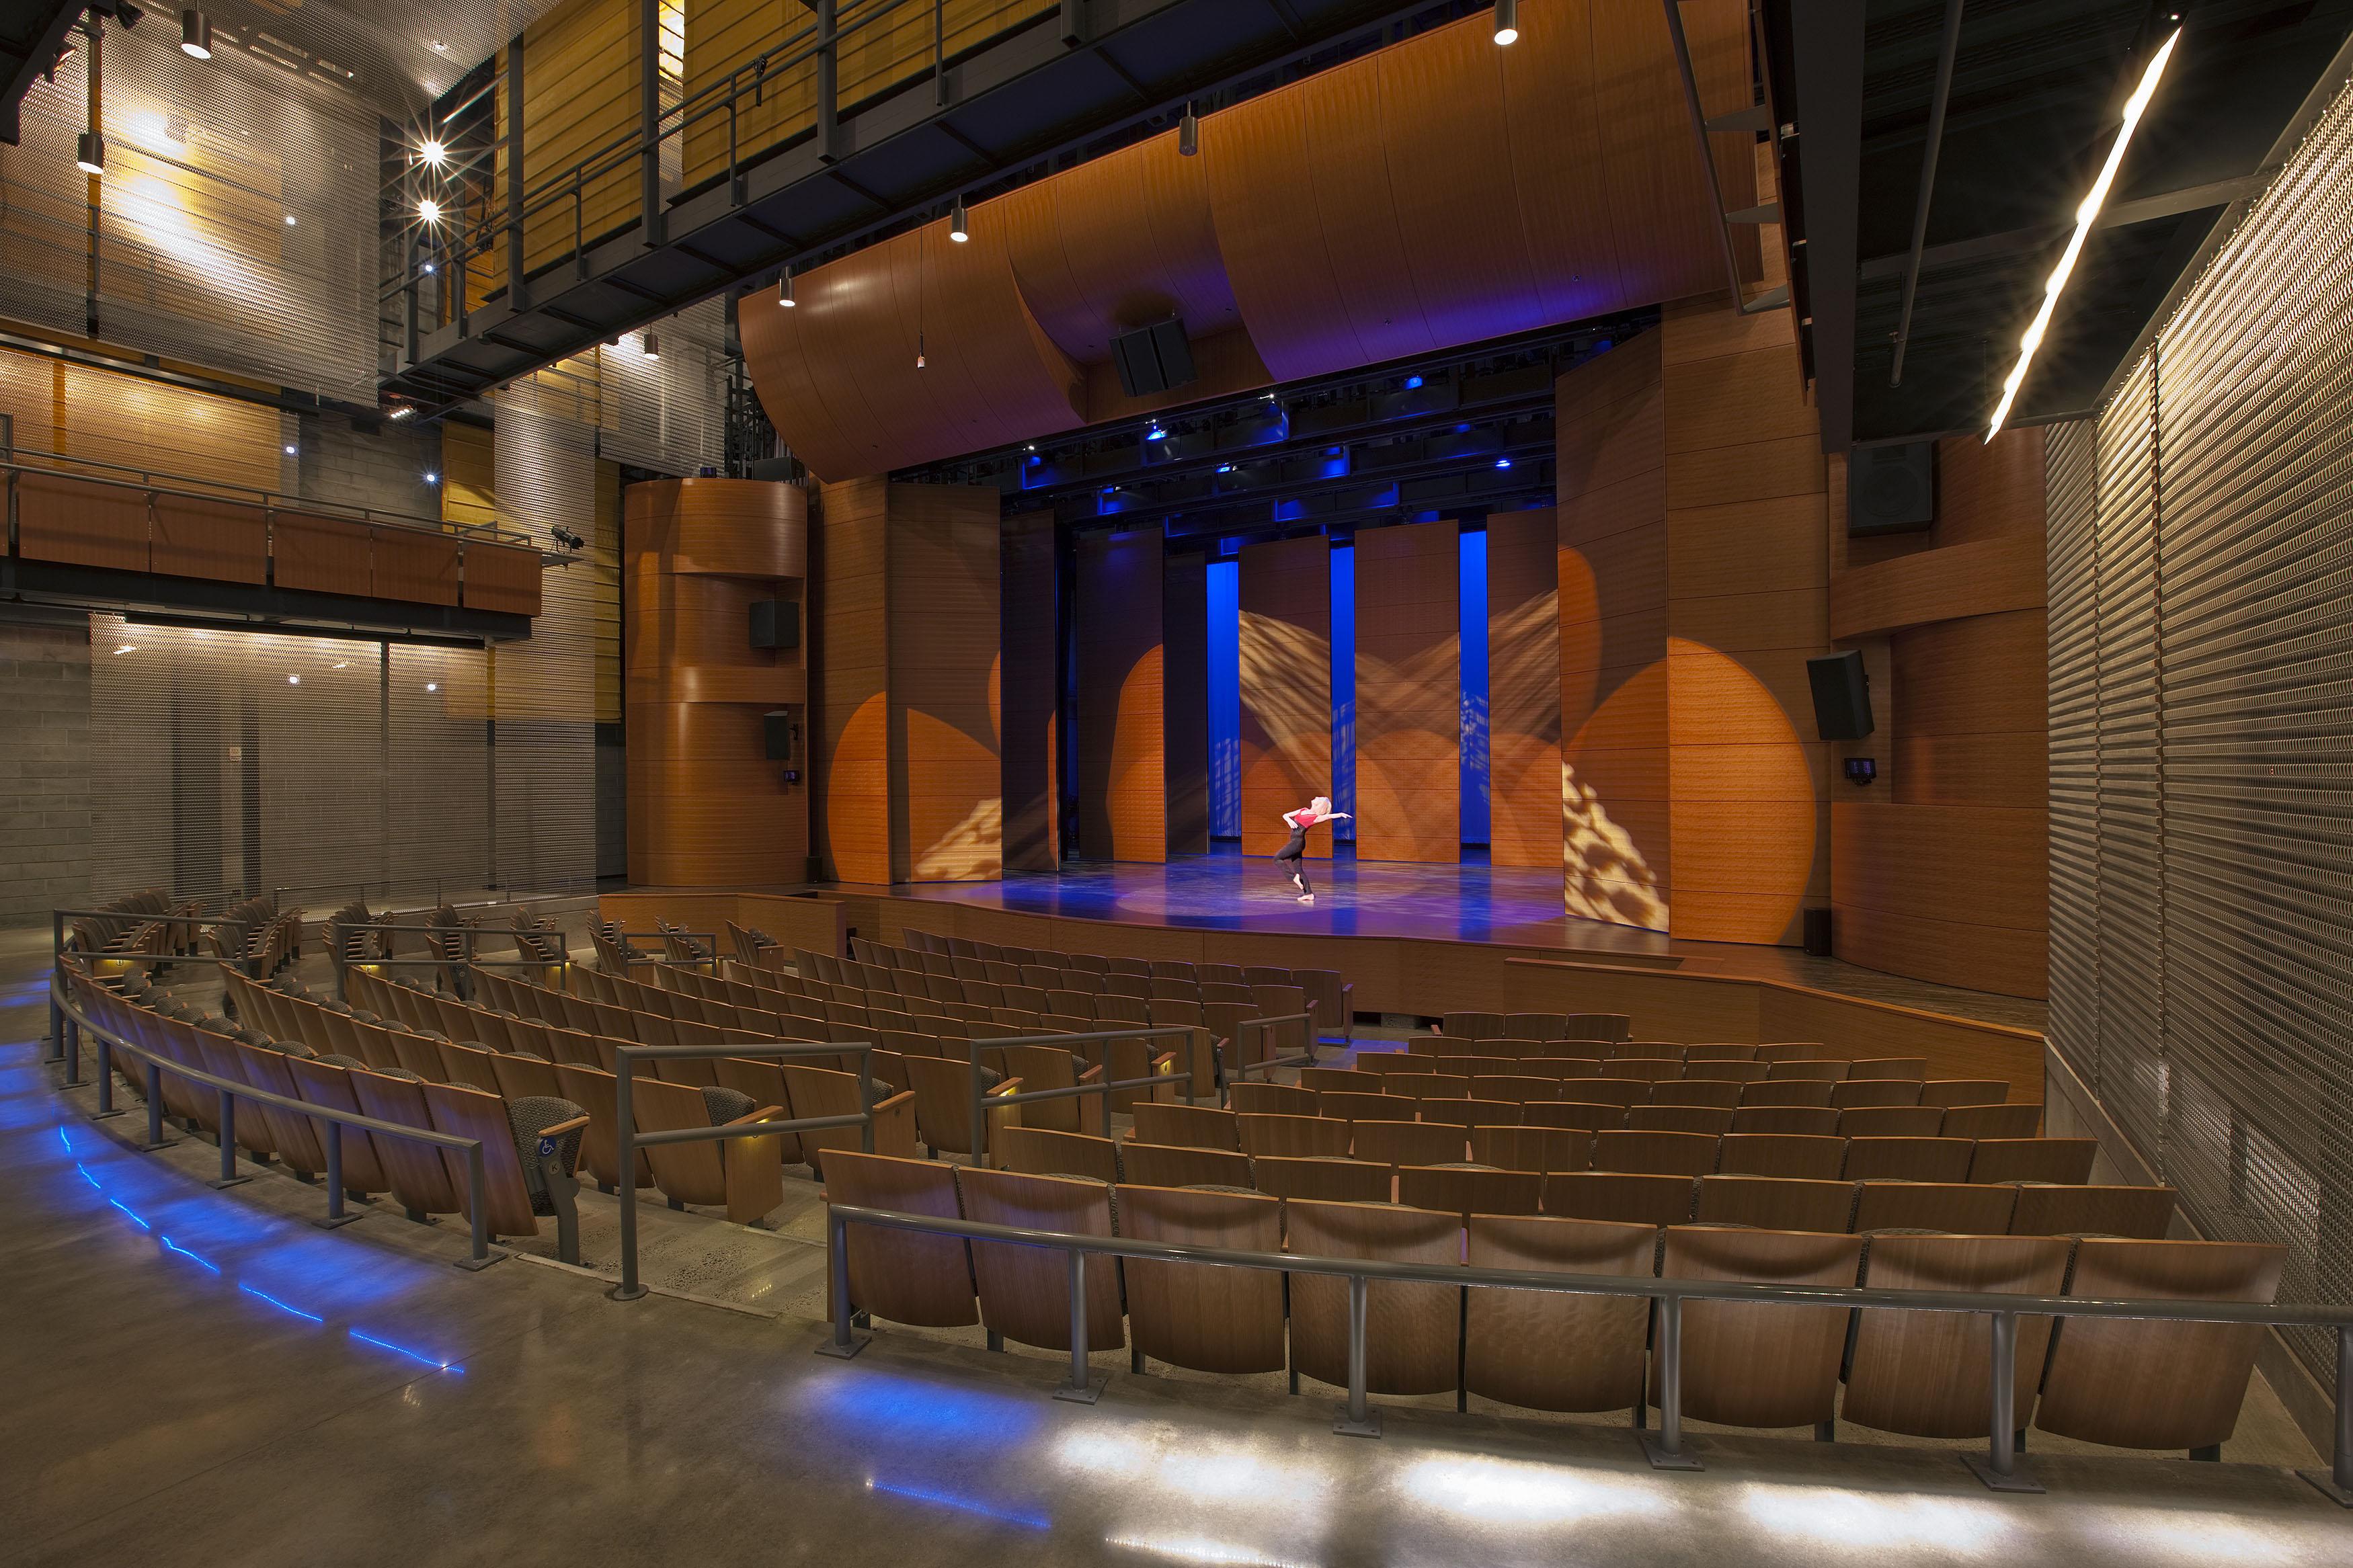 MD Interior Design Image of Theater at Montgomery College Arts Center R082416